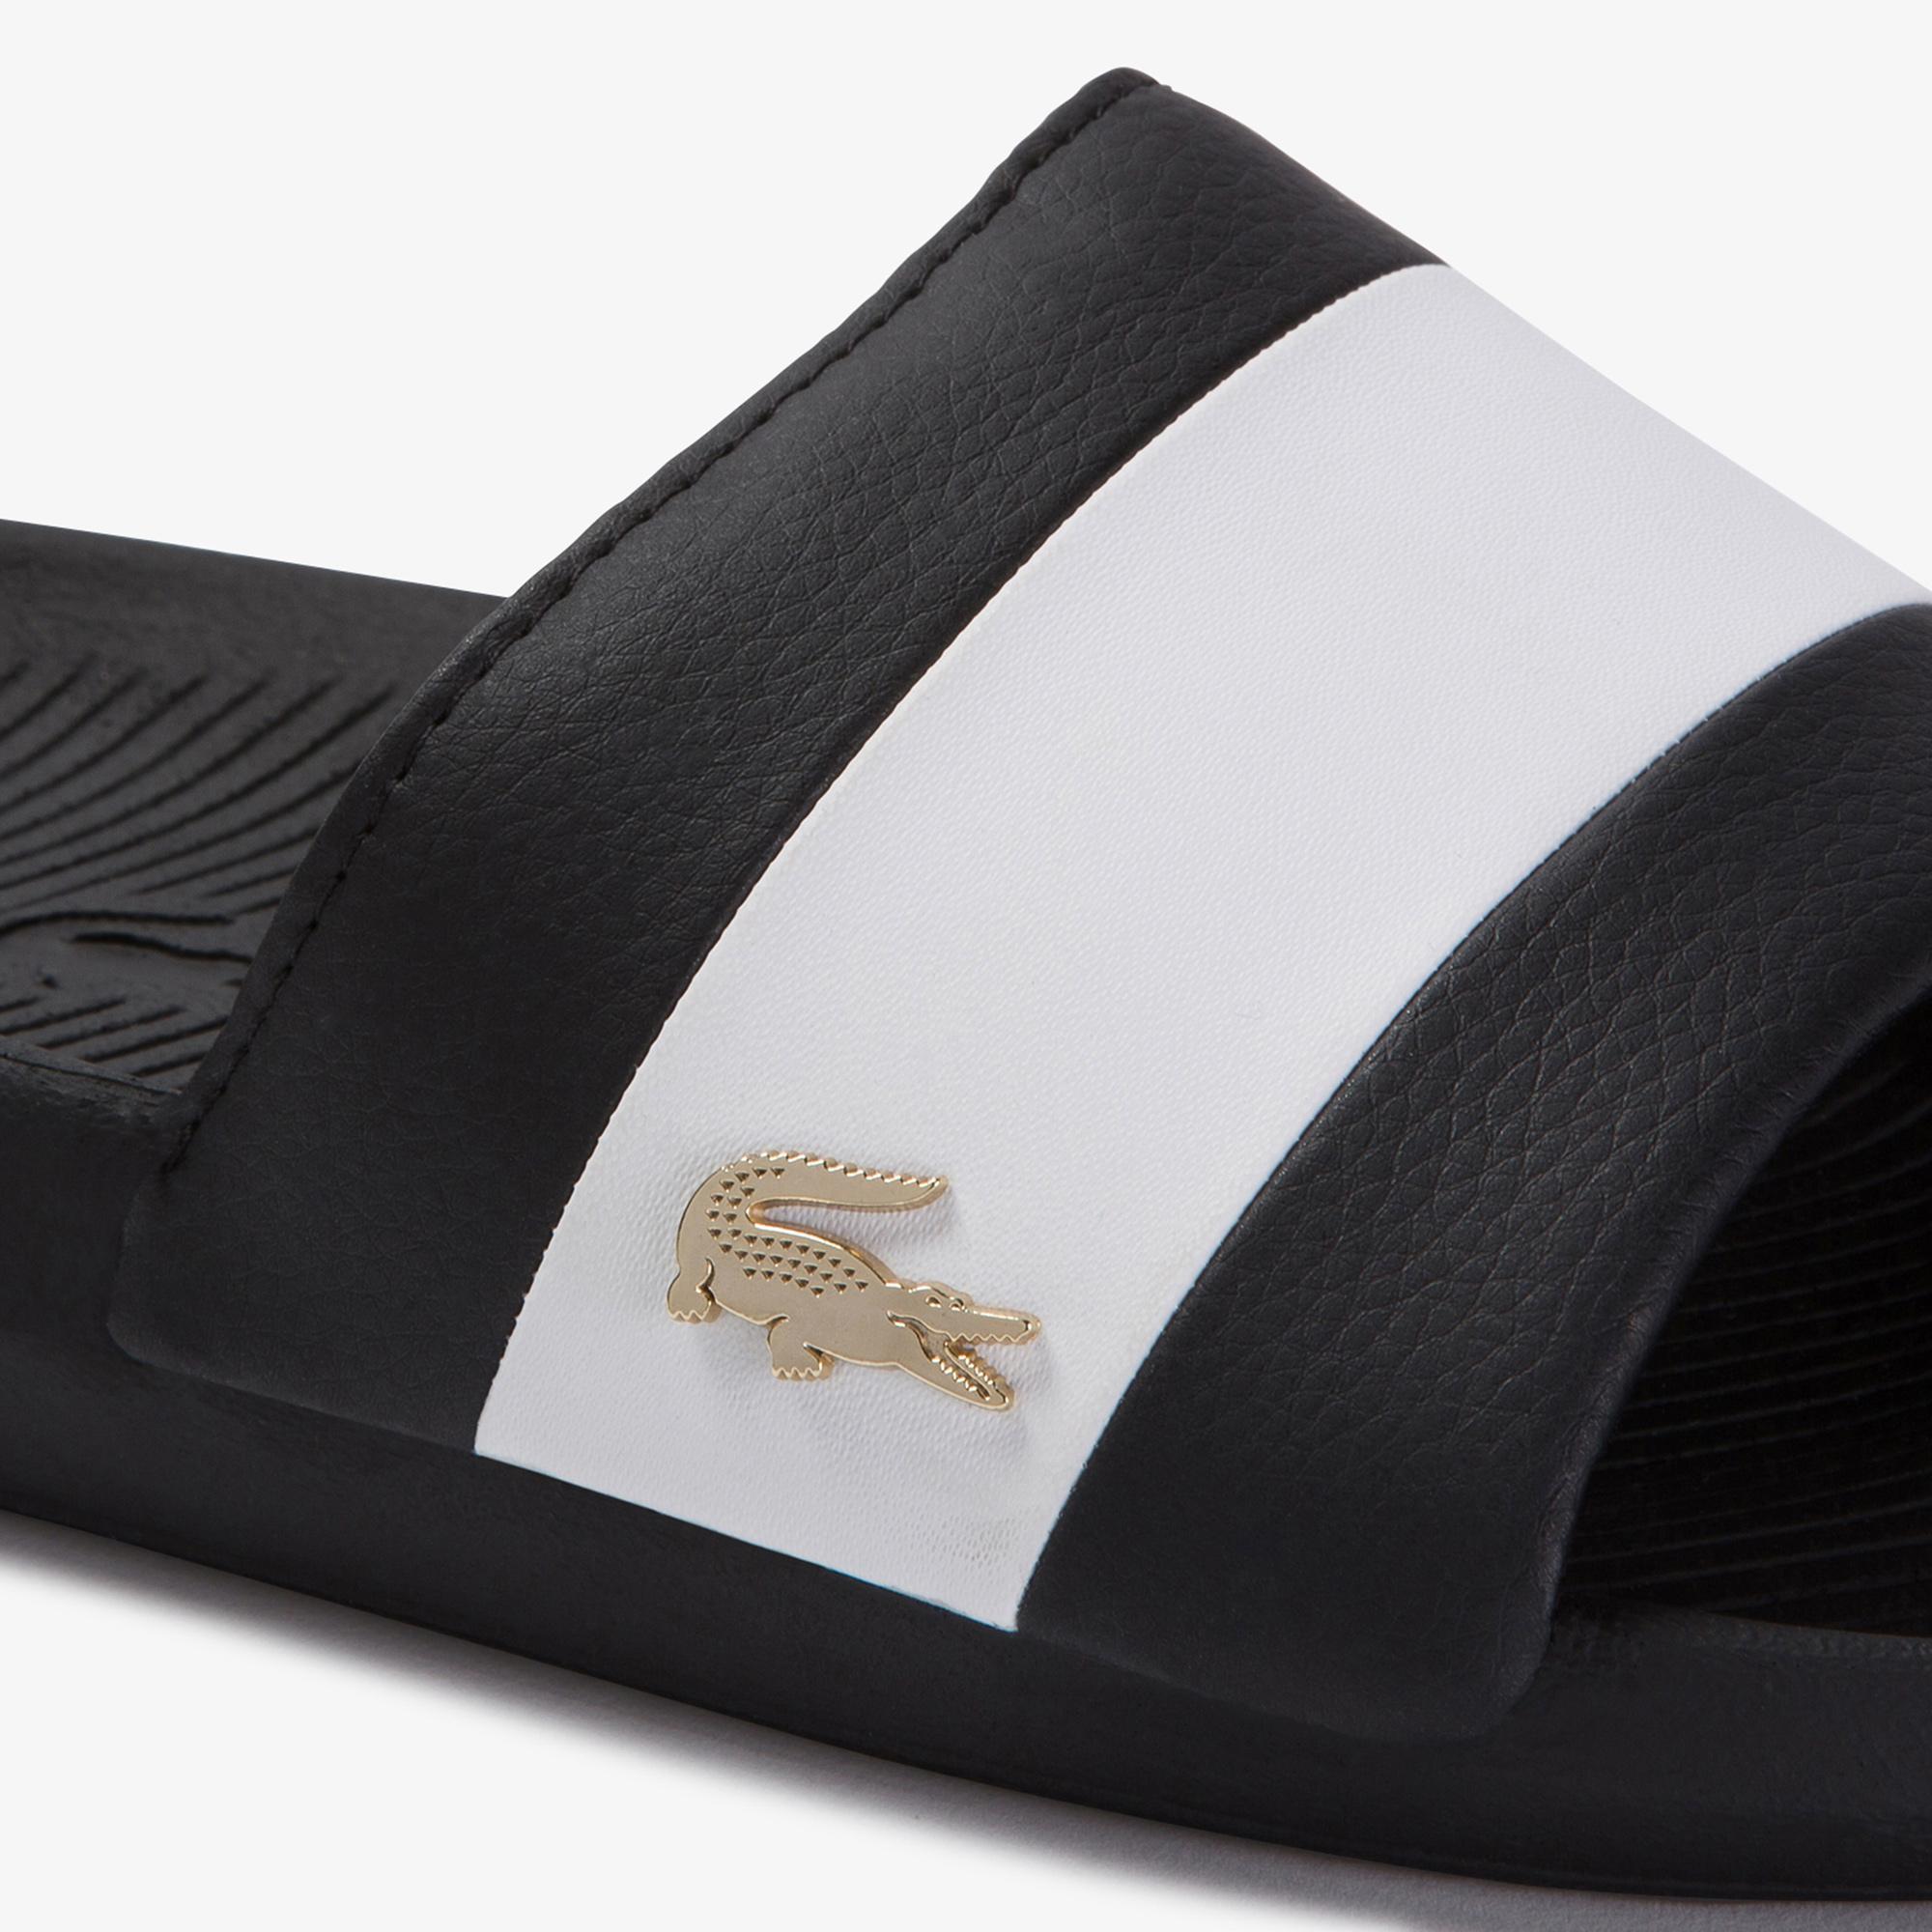 Lacoste Croco Slide 120 3 Us Cma Erkek Siyah - Beyaz Terlik